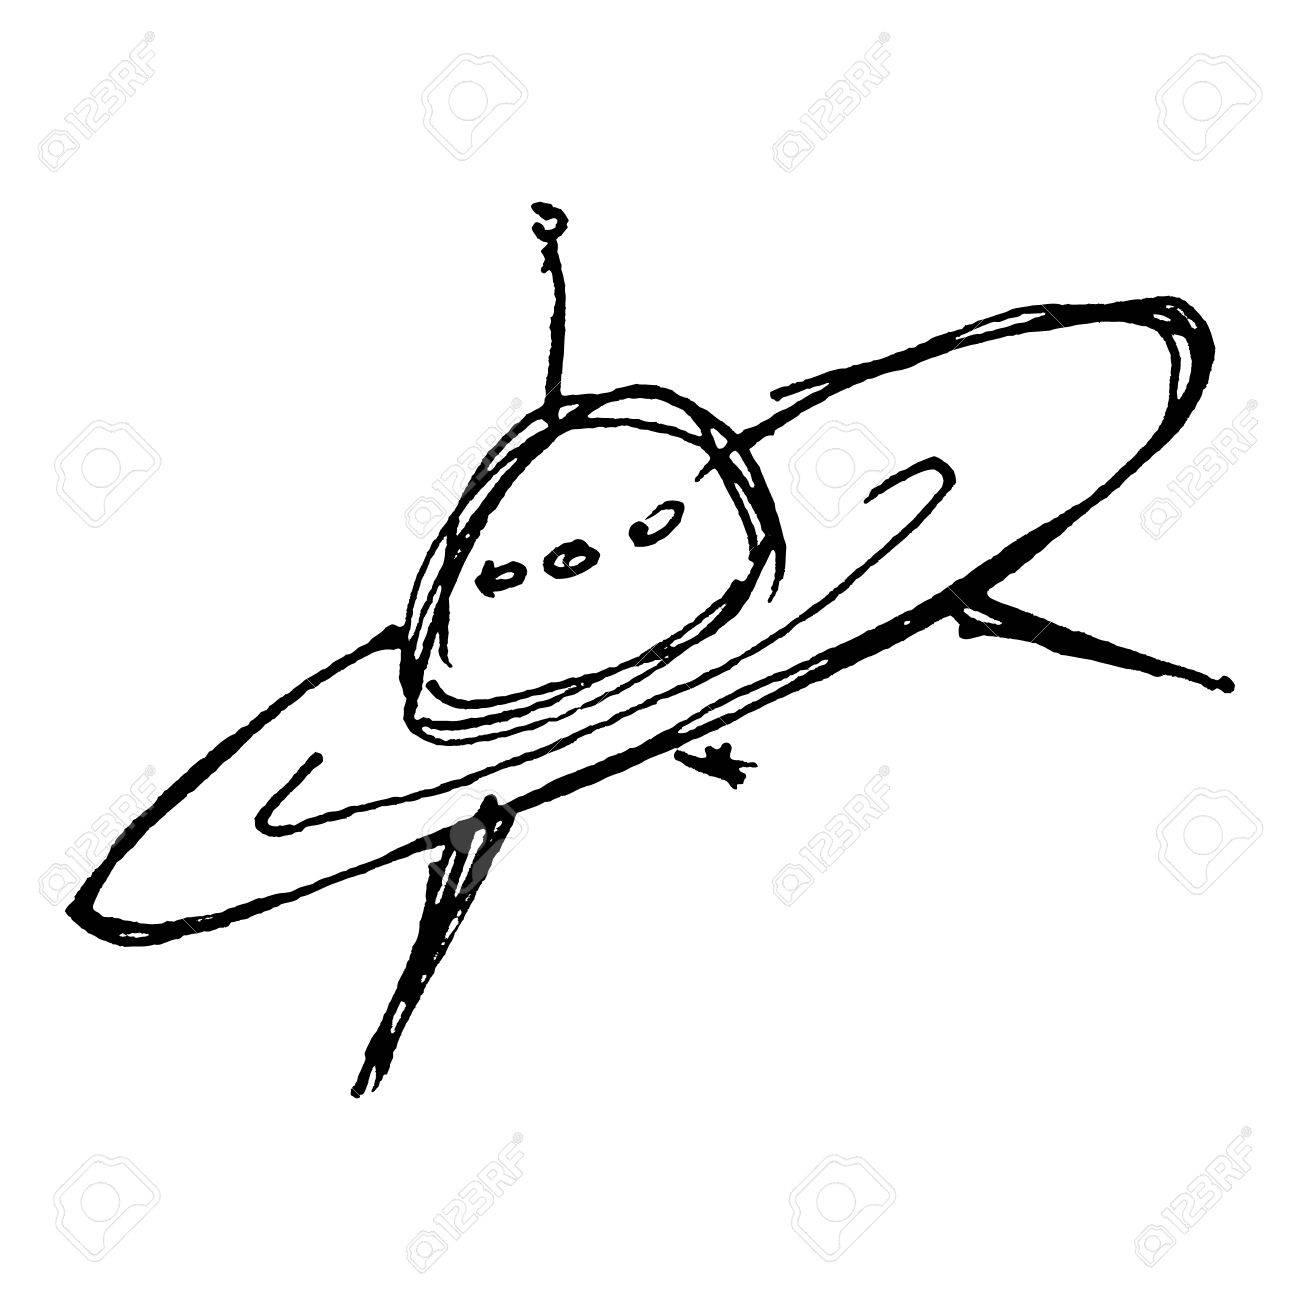 1300x1300 Hand Drawn Cartoon Style Spaceship Design Stock Photo, Picture